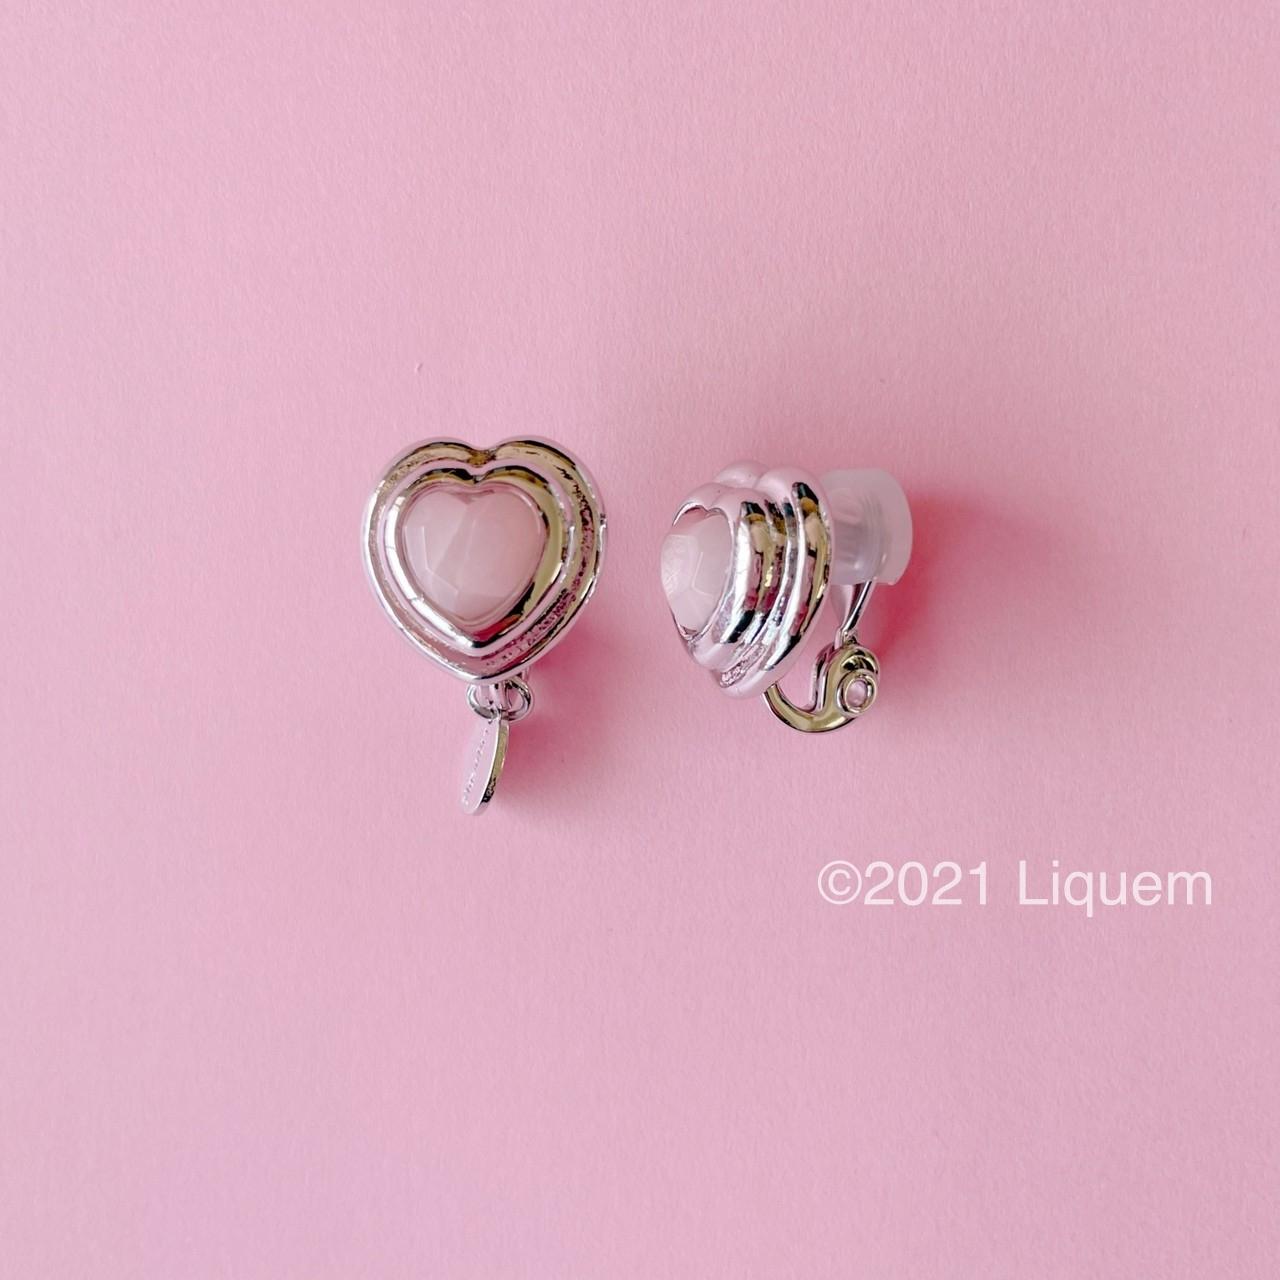 Liquem / POTTEイヤリング